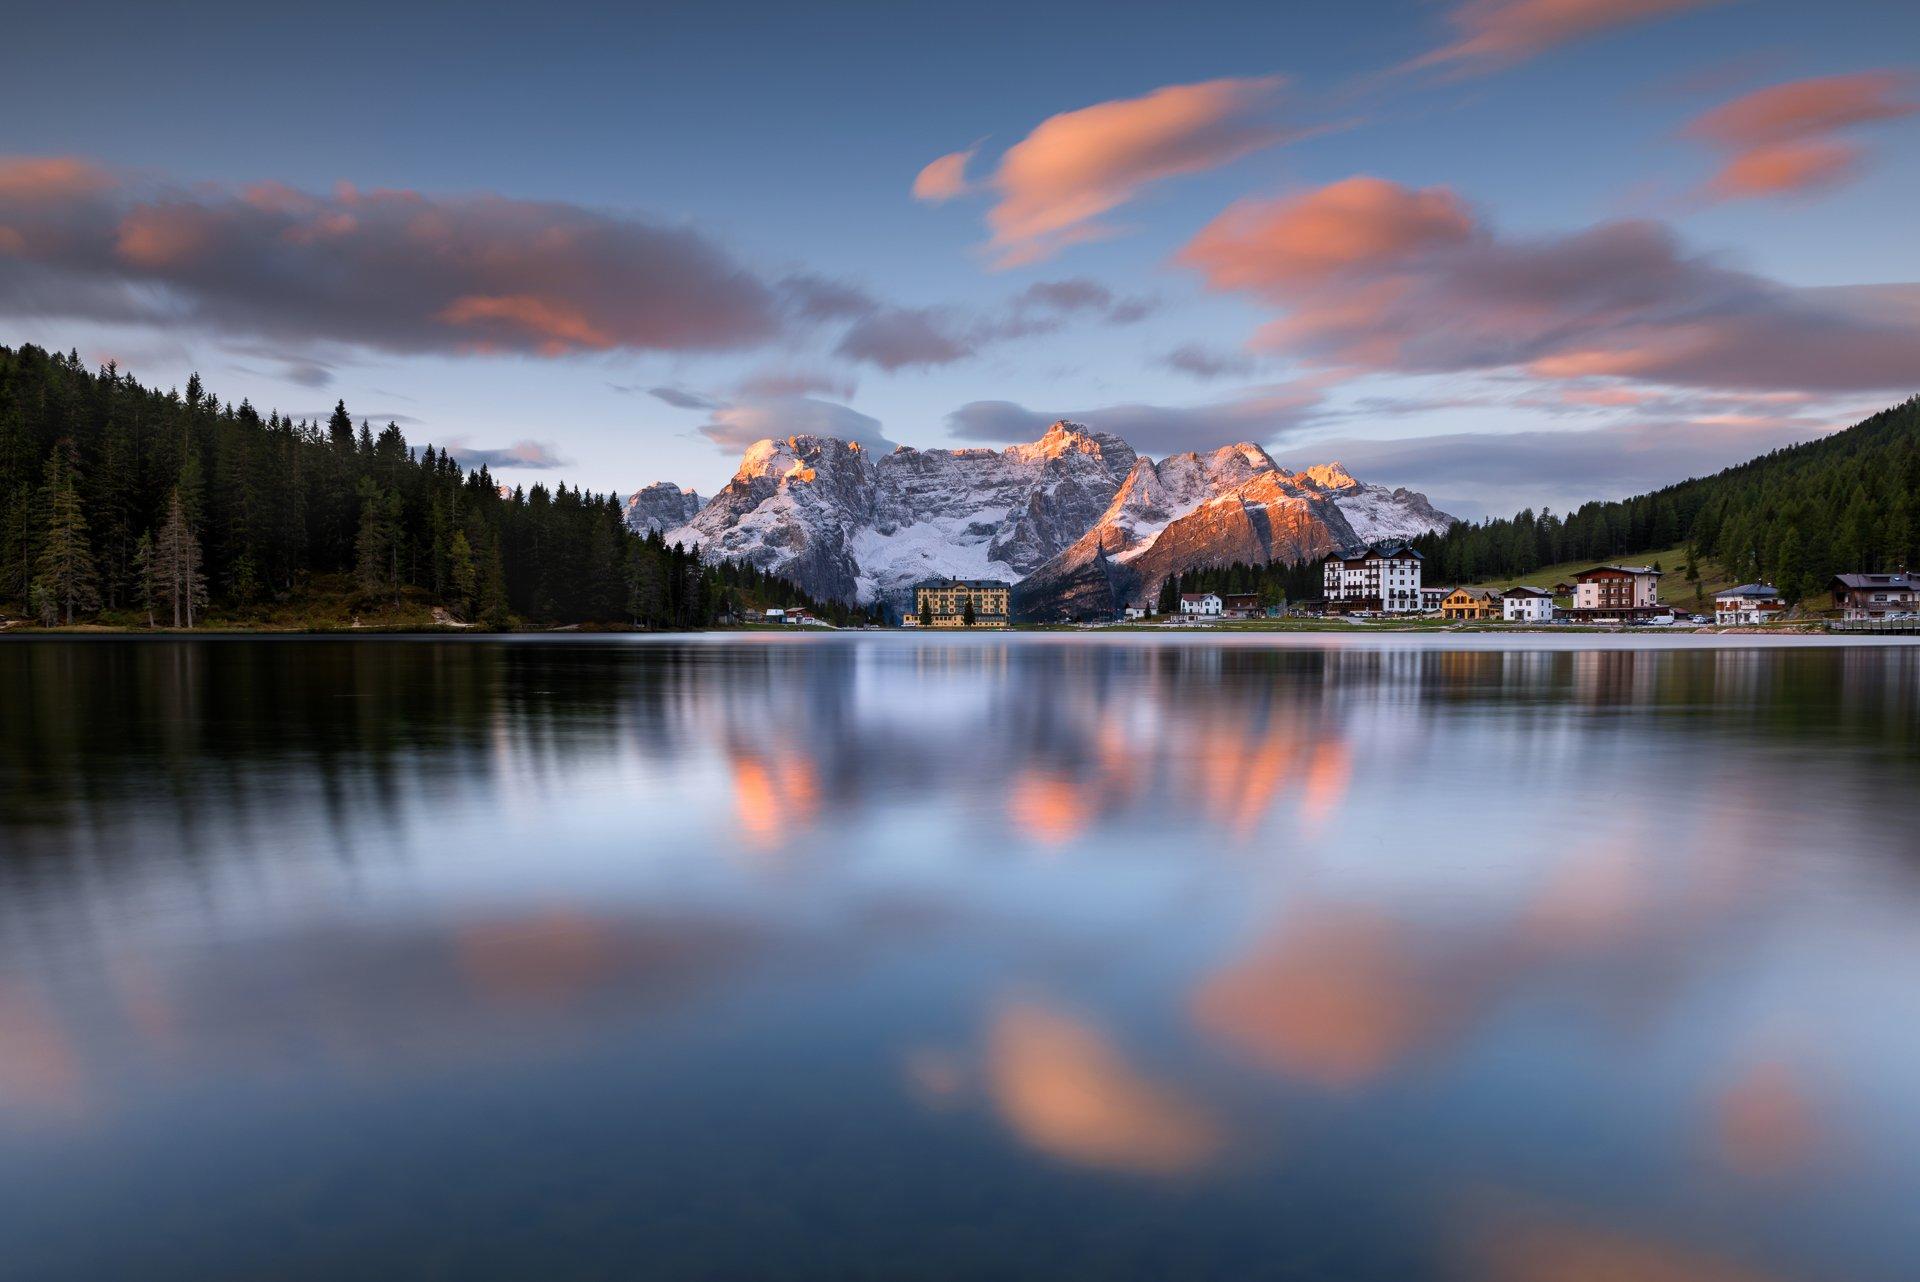 Hugo, Só, HugoSó, Nikon, D810, NikonD810, Dolomites, Misurina, Lake, Italia, Italy, Dolomiti, Lago, Clouds, Water, Hugo Só